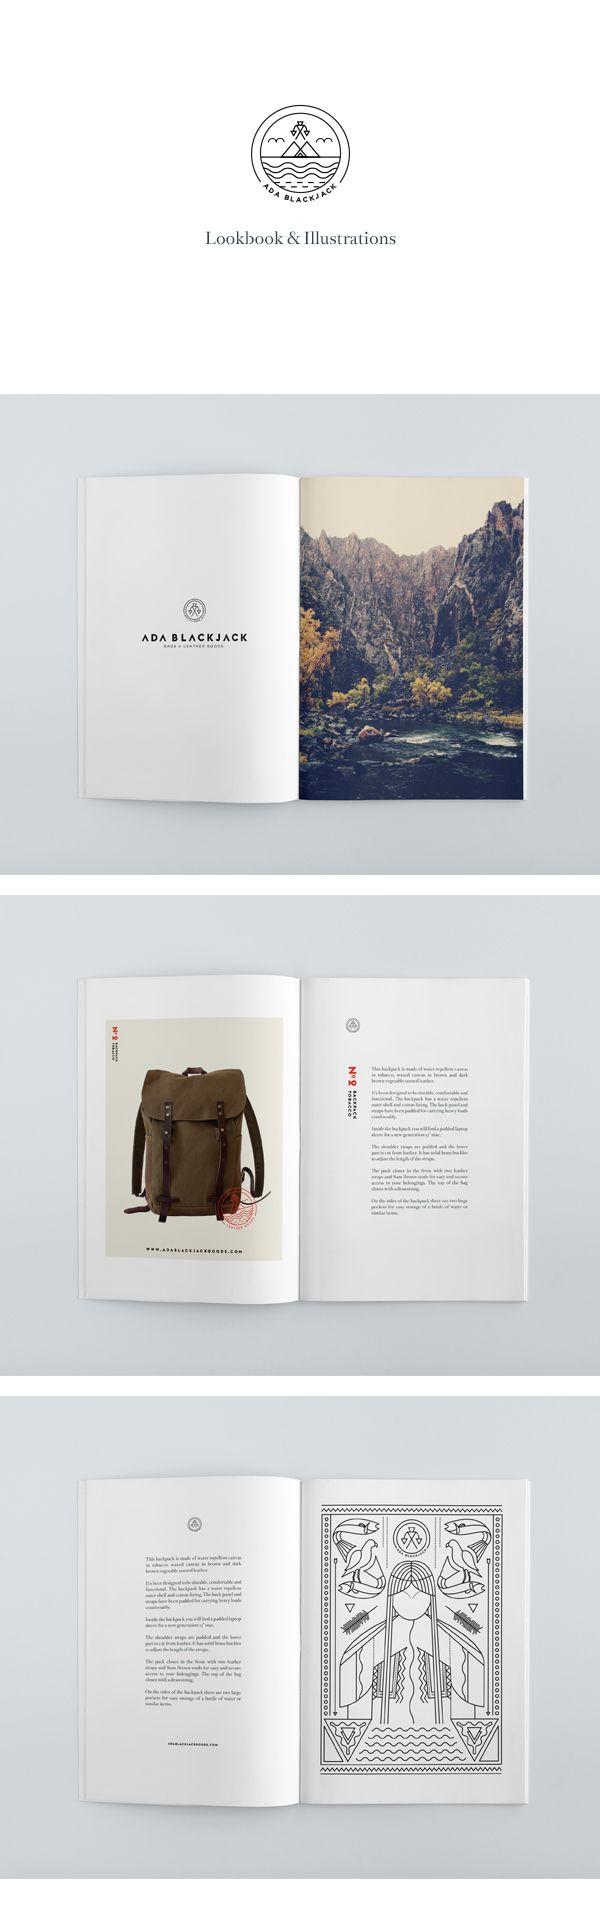 Ada Blackjack - Brand Identity by Tobias van Schneider, via Behance